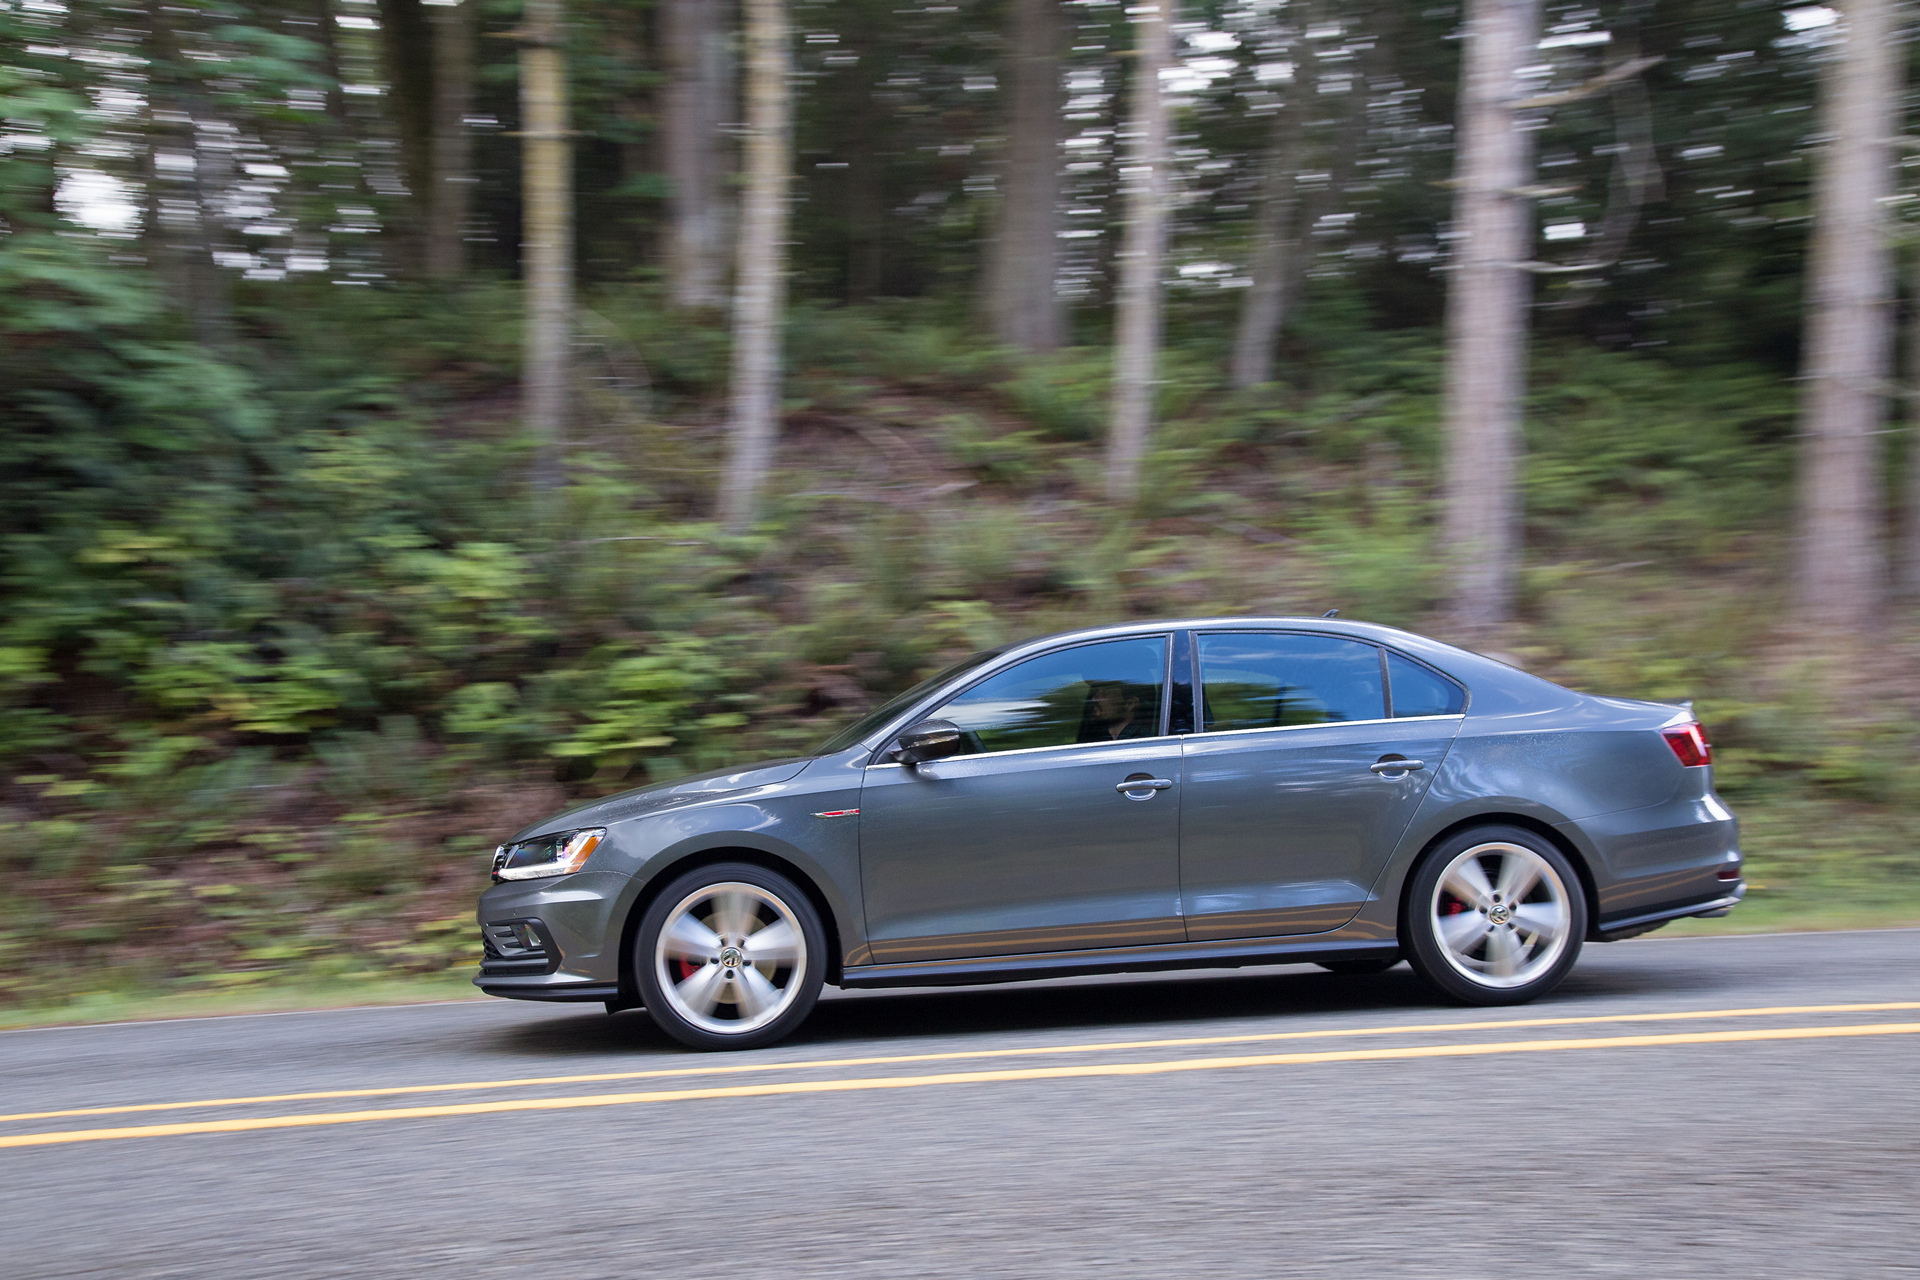 2017 Volkswagen Jetta GLI © Volkswagen AG